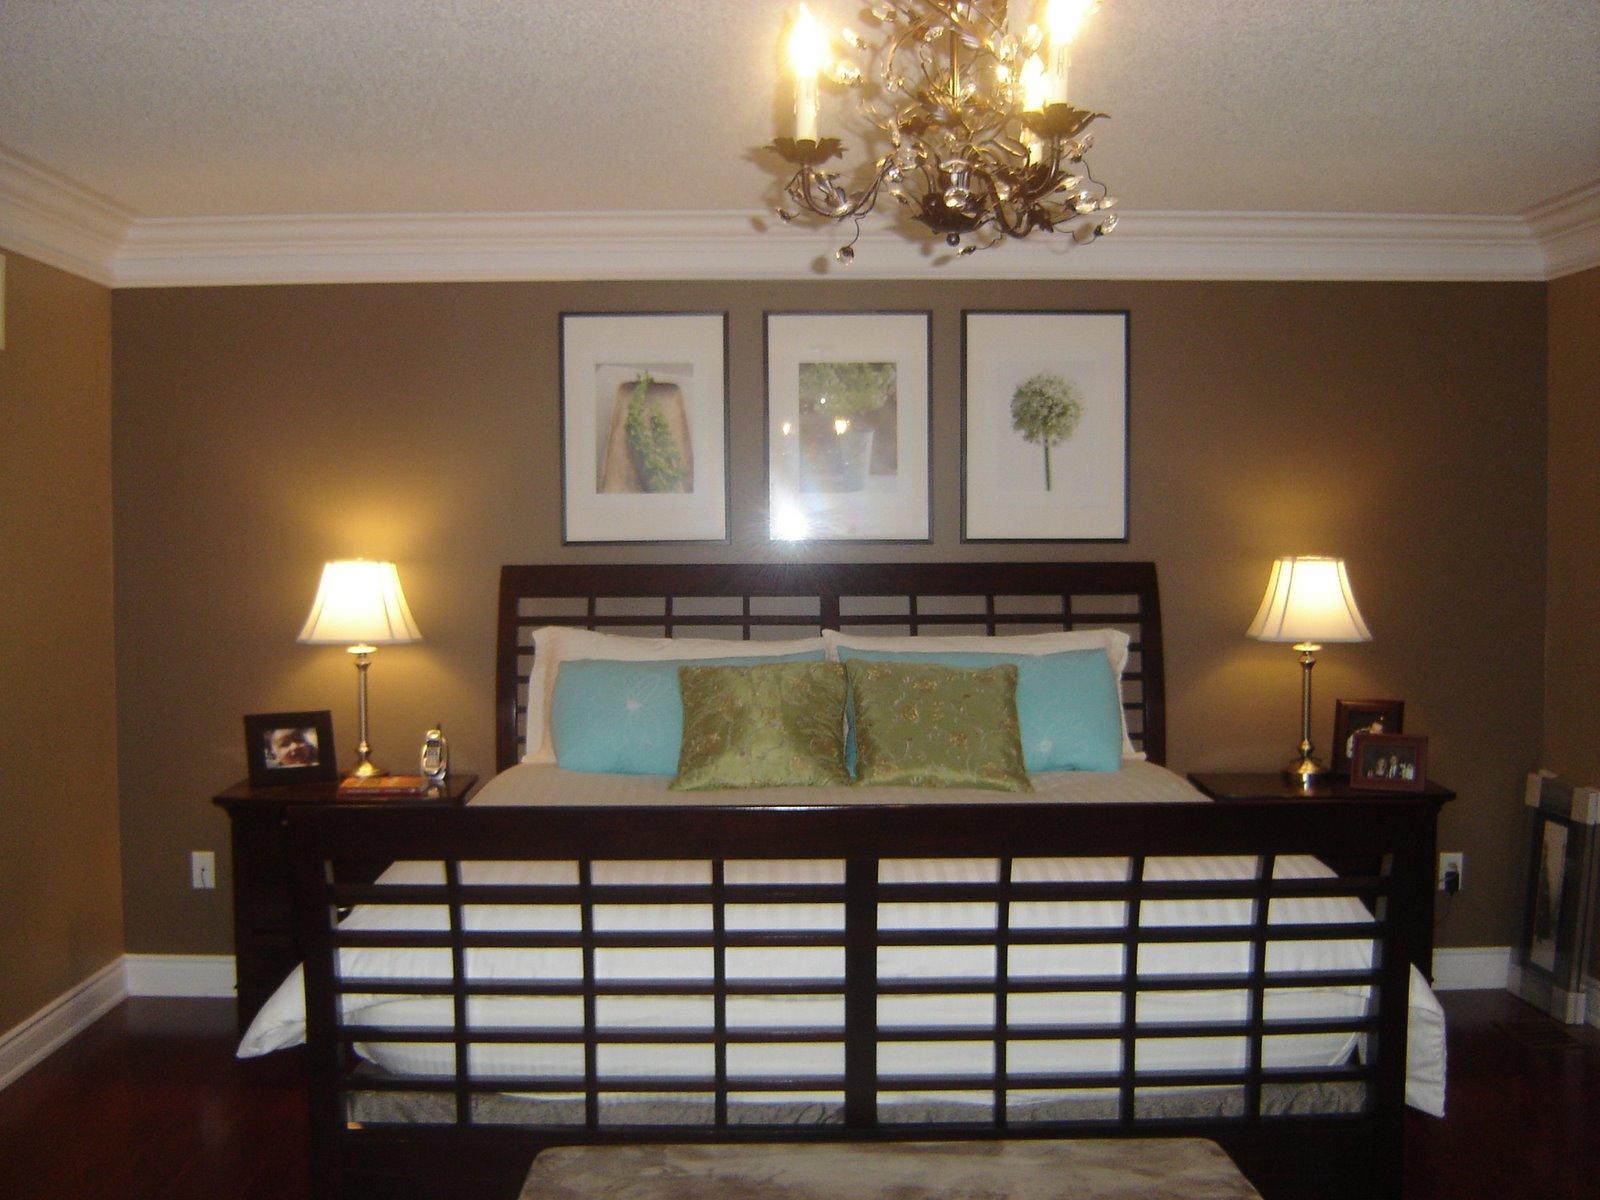 Bedroom Wall Colors Cukjatidesign Com. Best Wall Color For Dark Bedroom Furniture   Bedroom Style Ideas